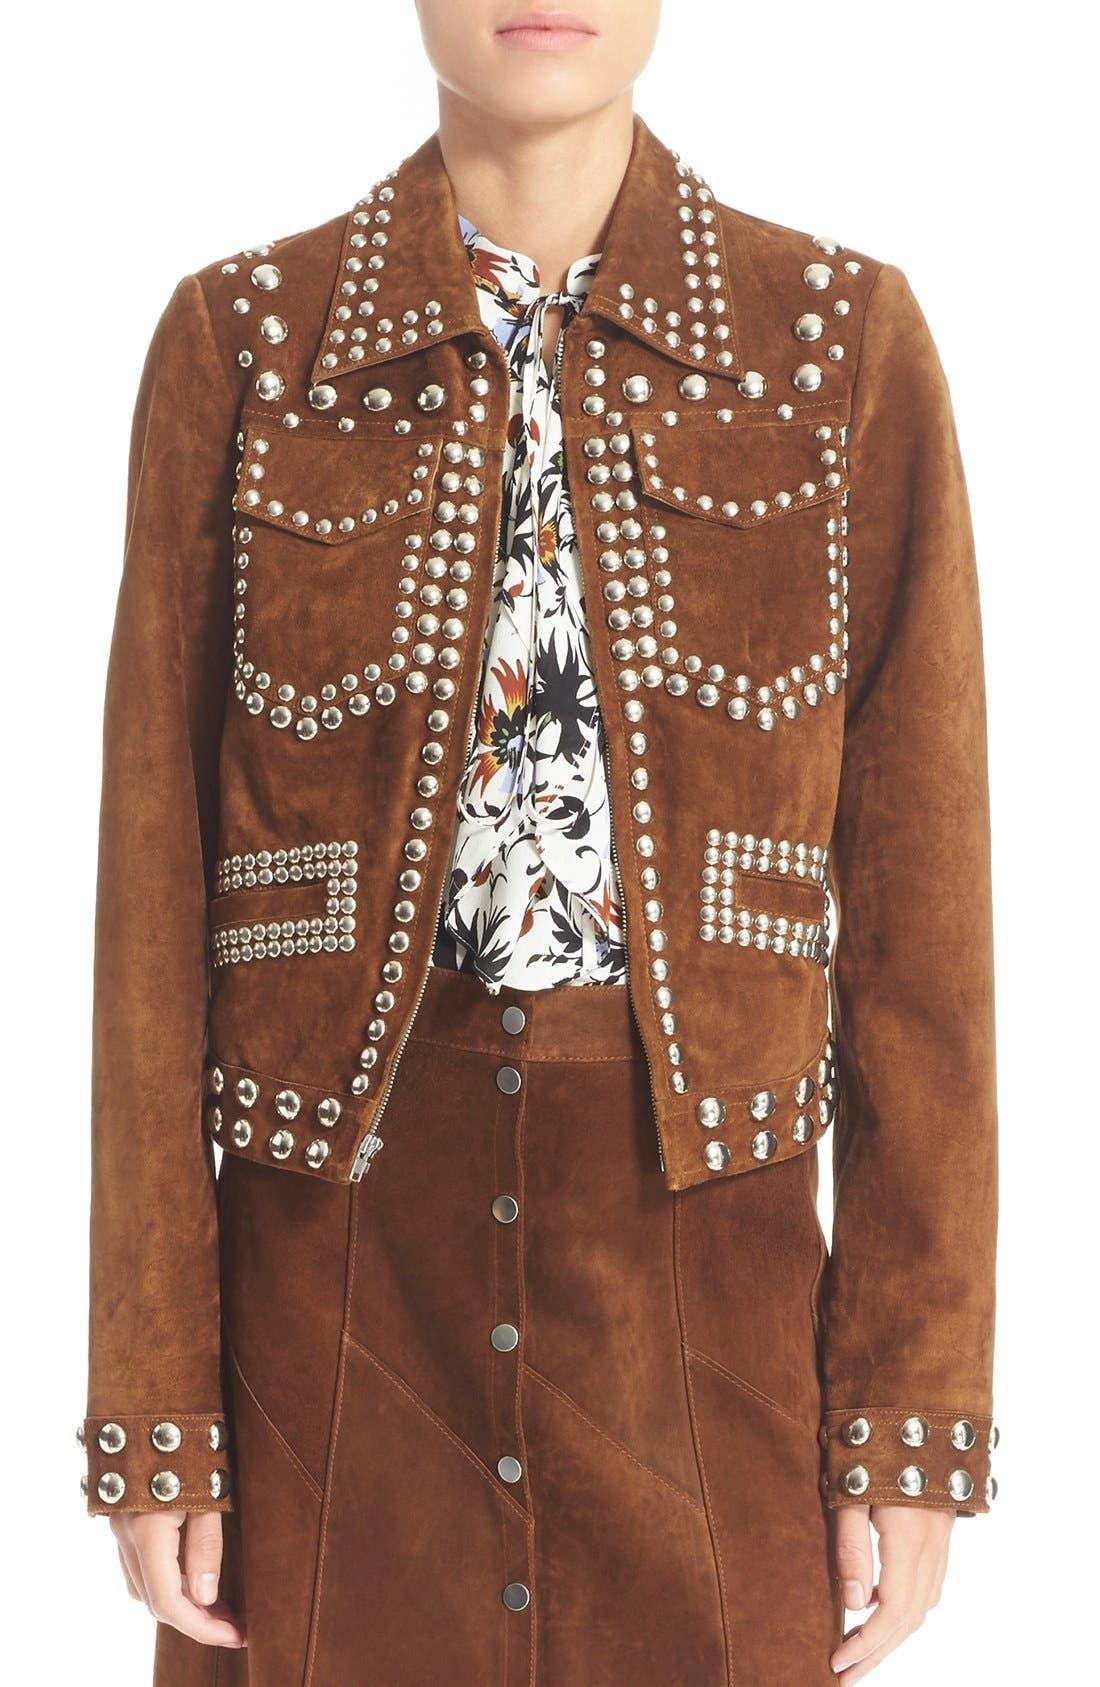 Main Image - A.L.C. 'Blaine' Studded Suede Jacket